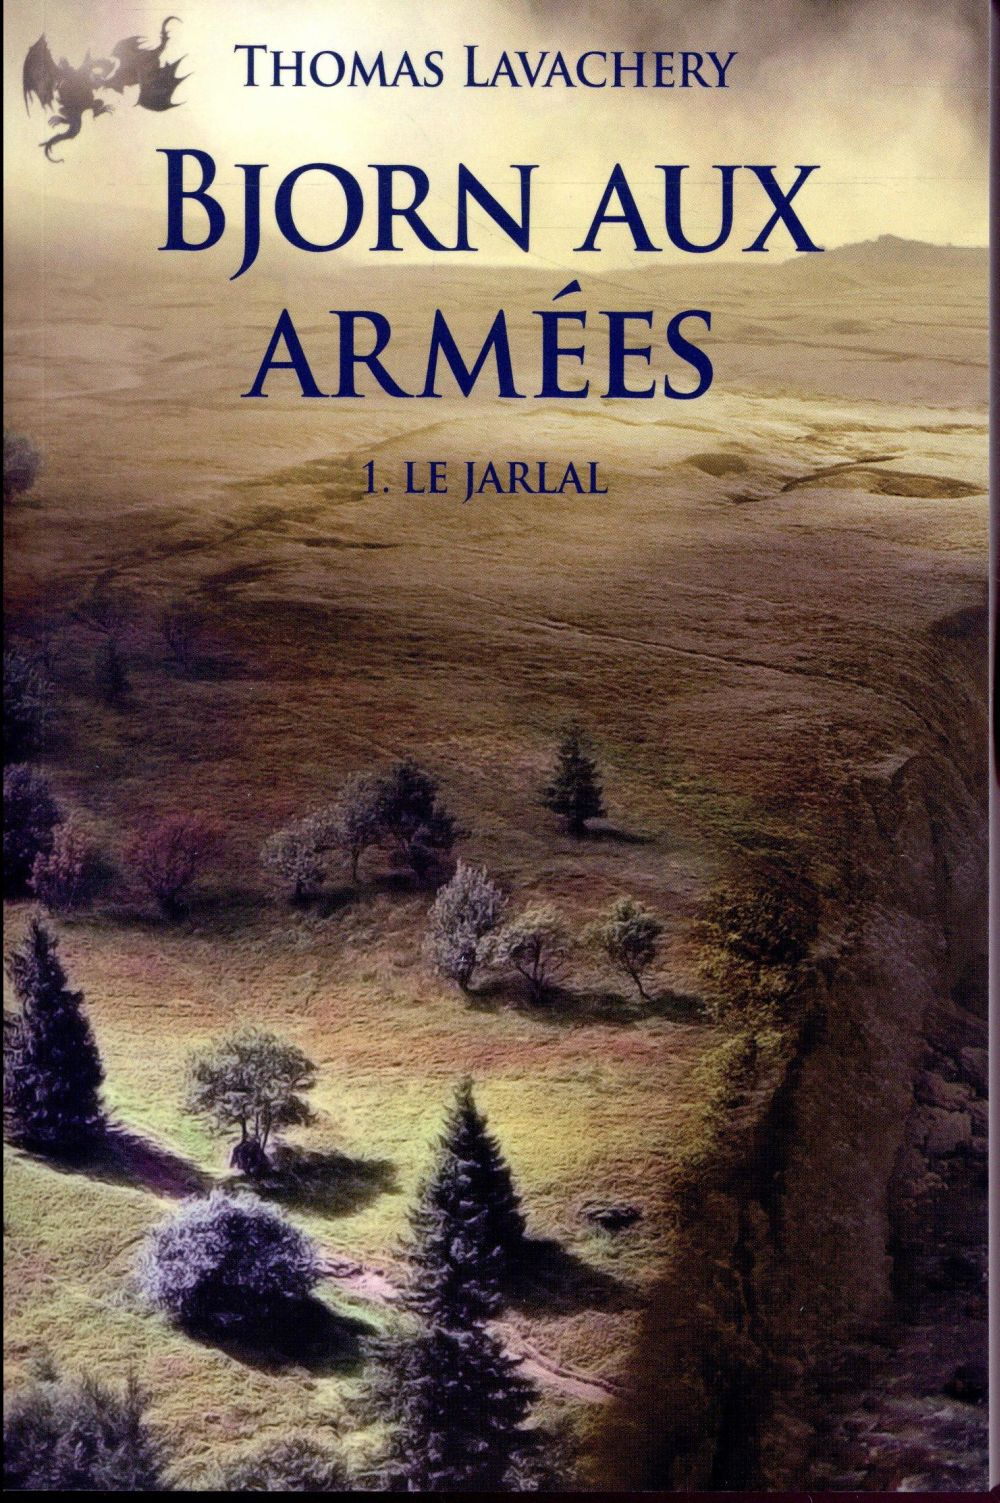 BJORN AUX ARMEES I - LE JARLAL